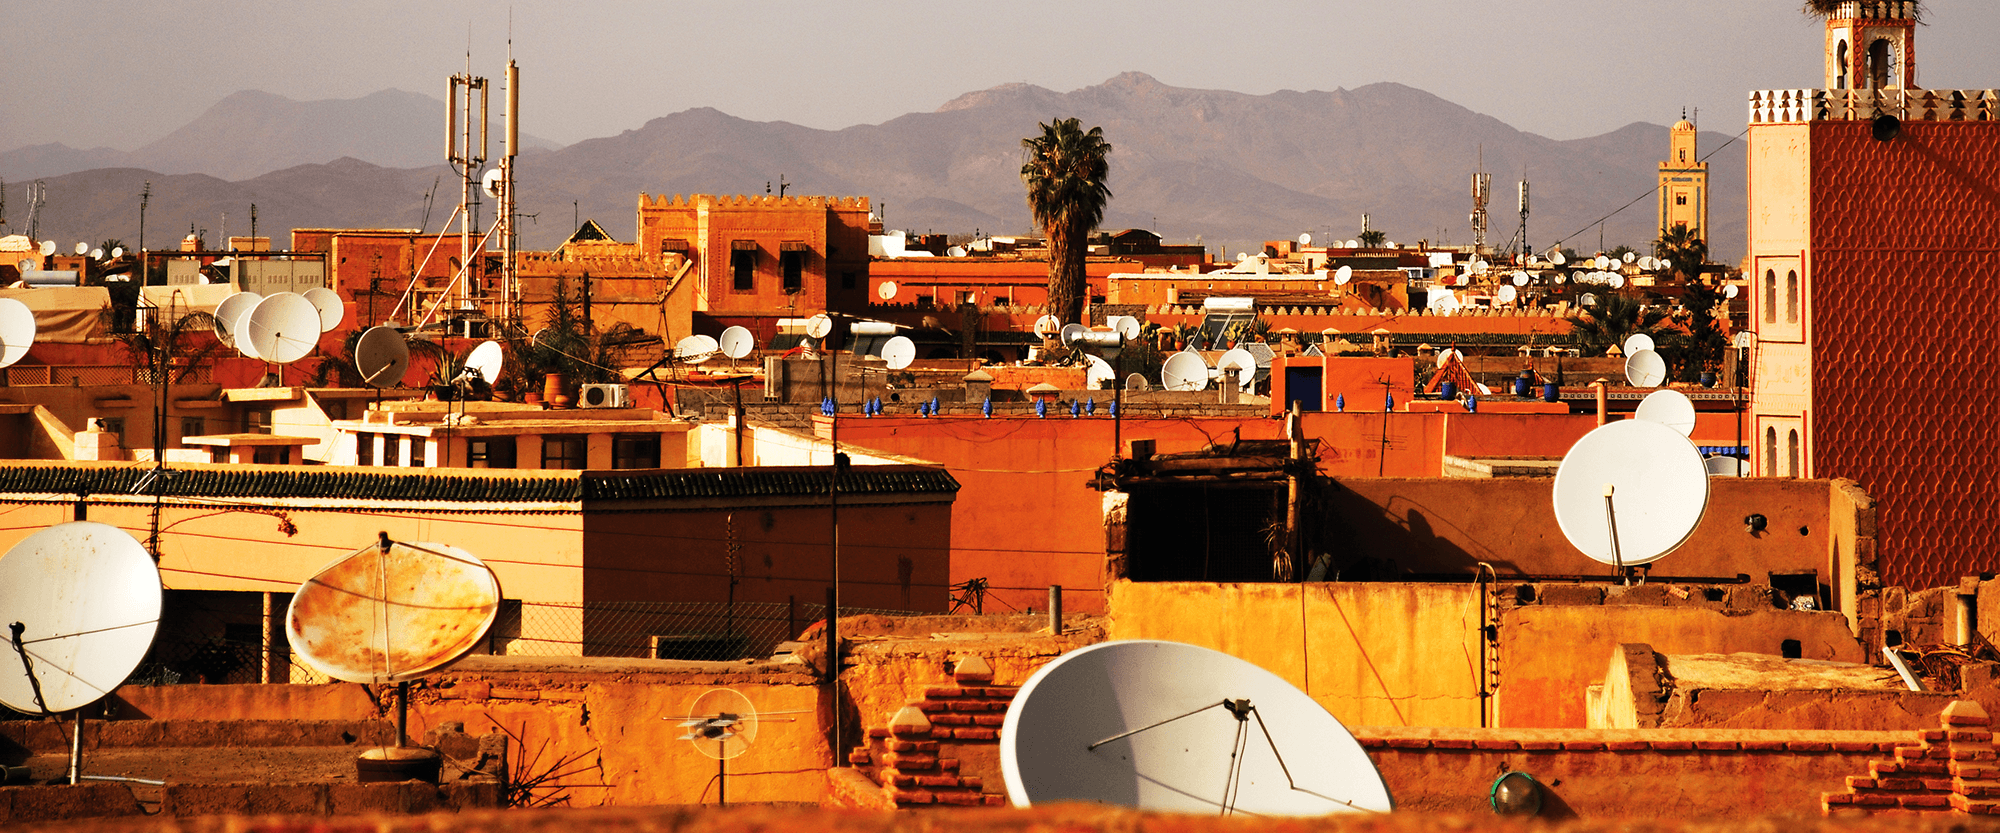 Rooftops in Lebanon